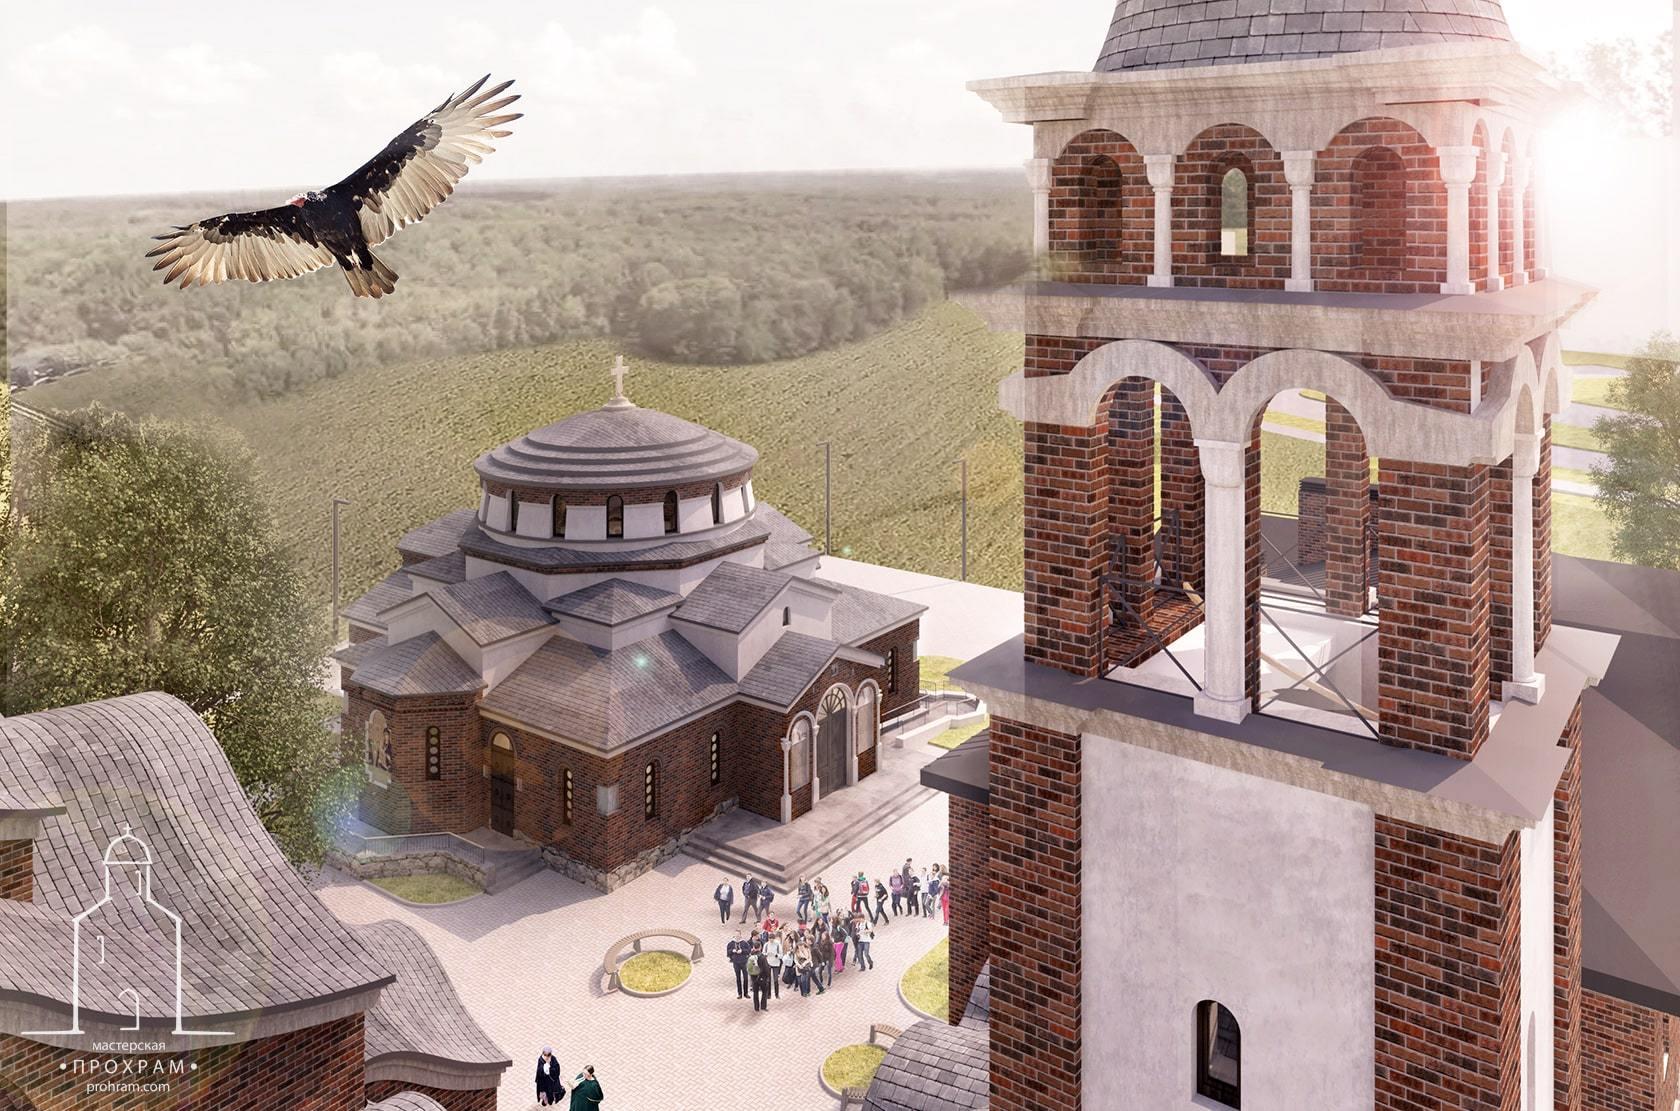 храм святителя Спиридона, проект храма Минск, архитектурный храм проект